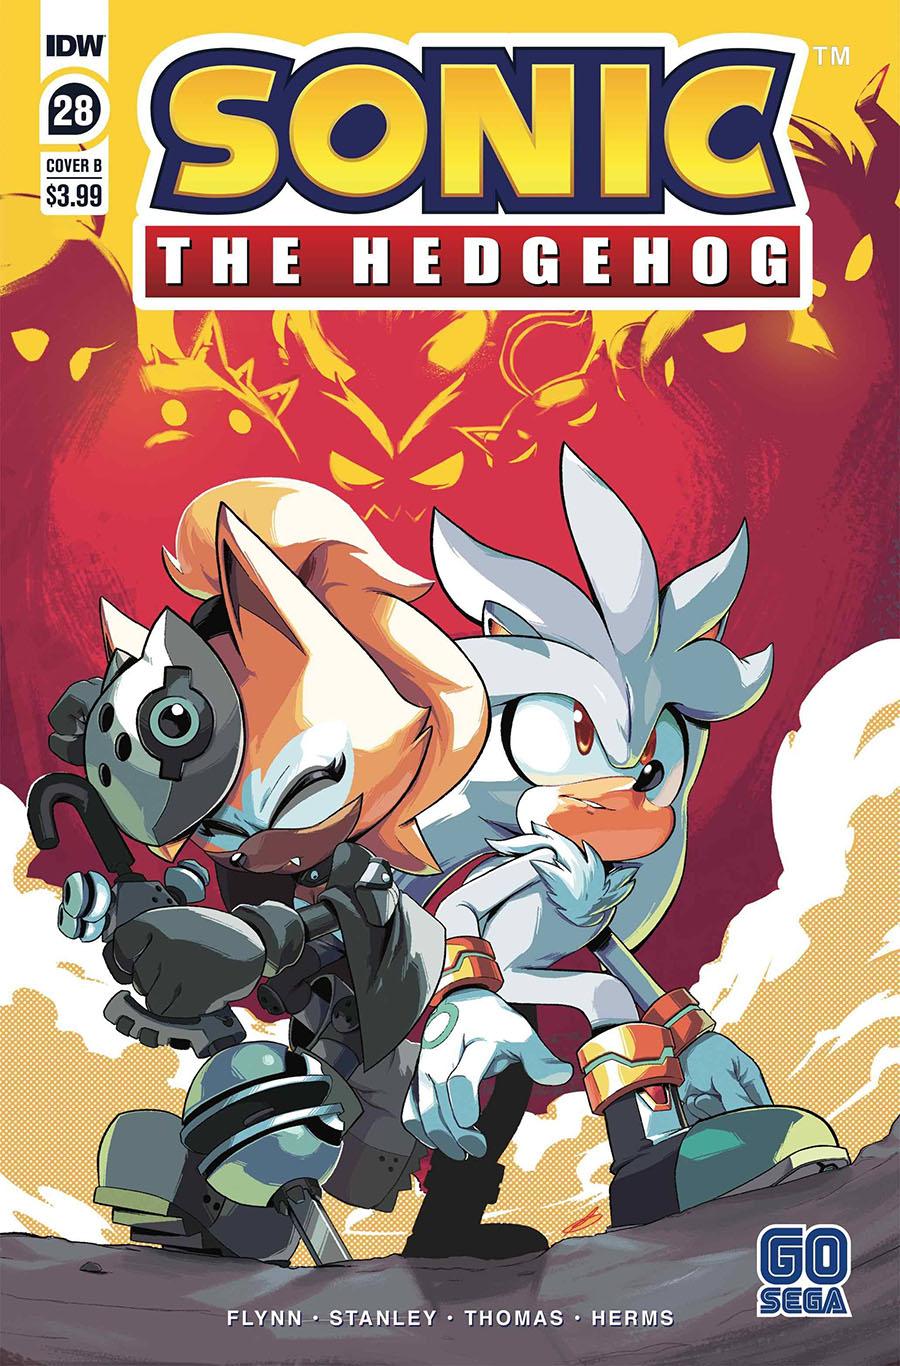 Sonic The Hedgehog #28 (2020)